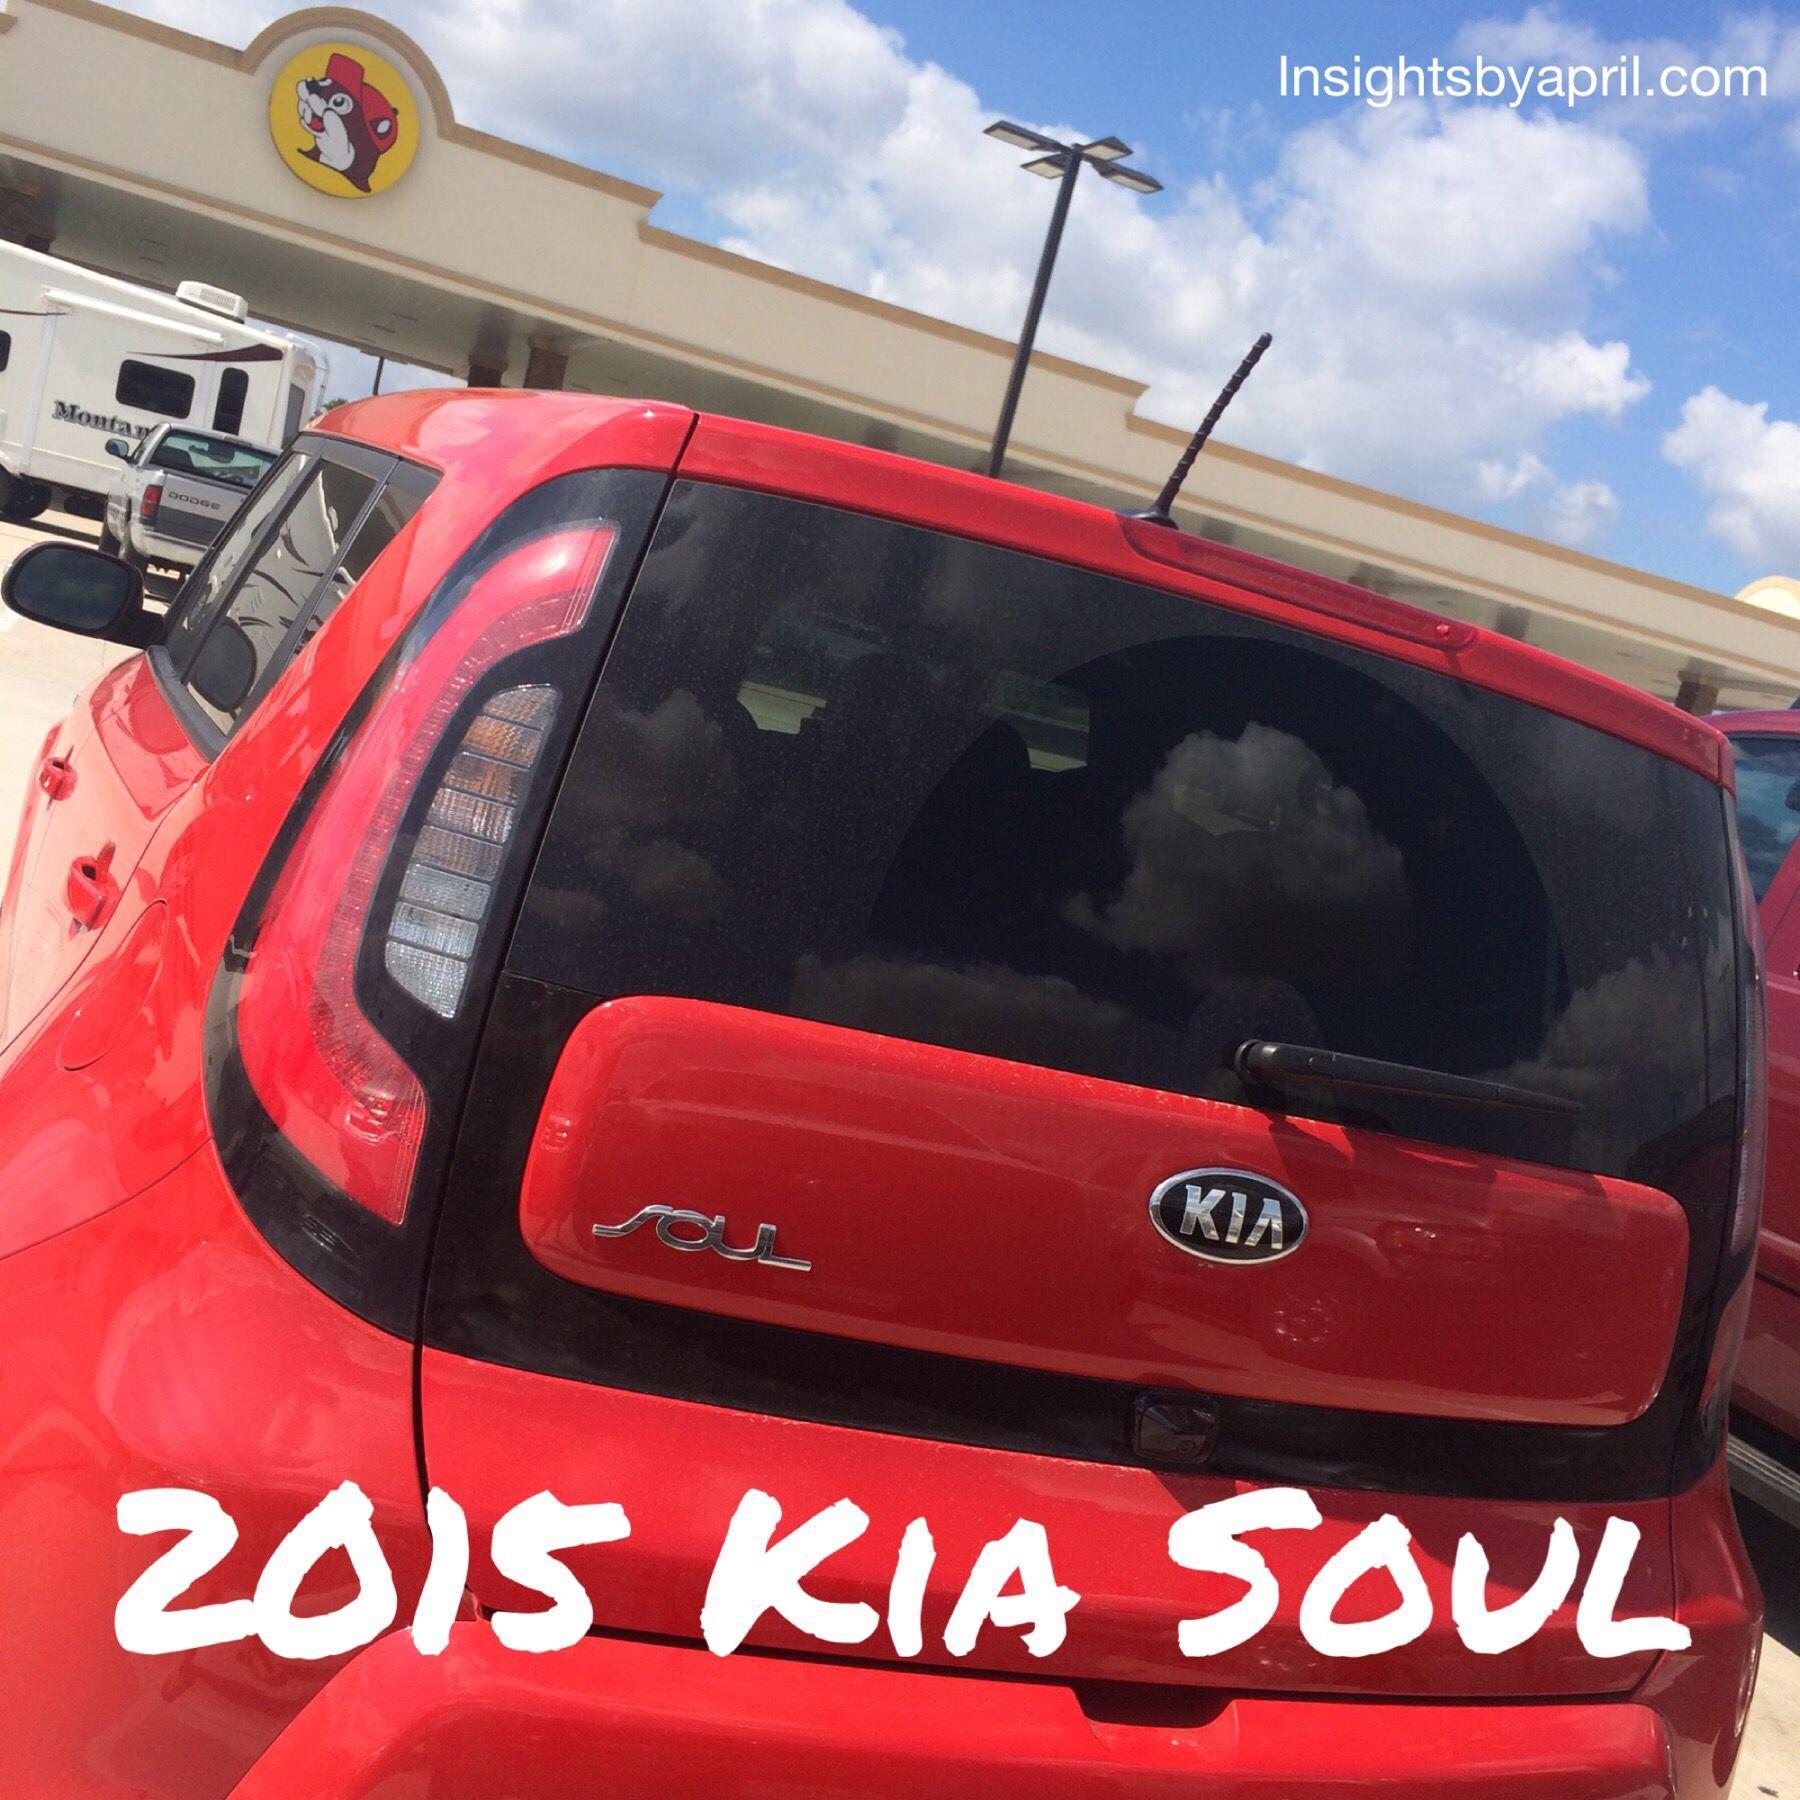 Taking the 2015 Kia Soul on one last mini vacation before school started. #DriveKia @DriveShopUSA